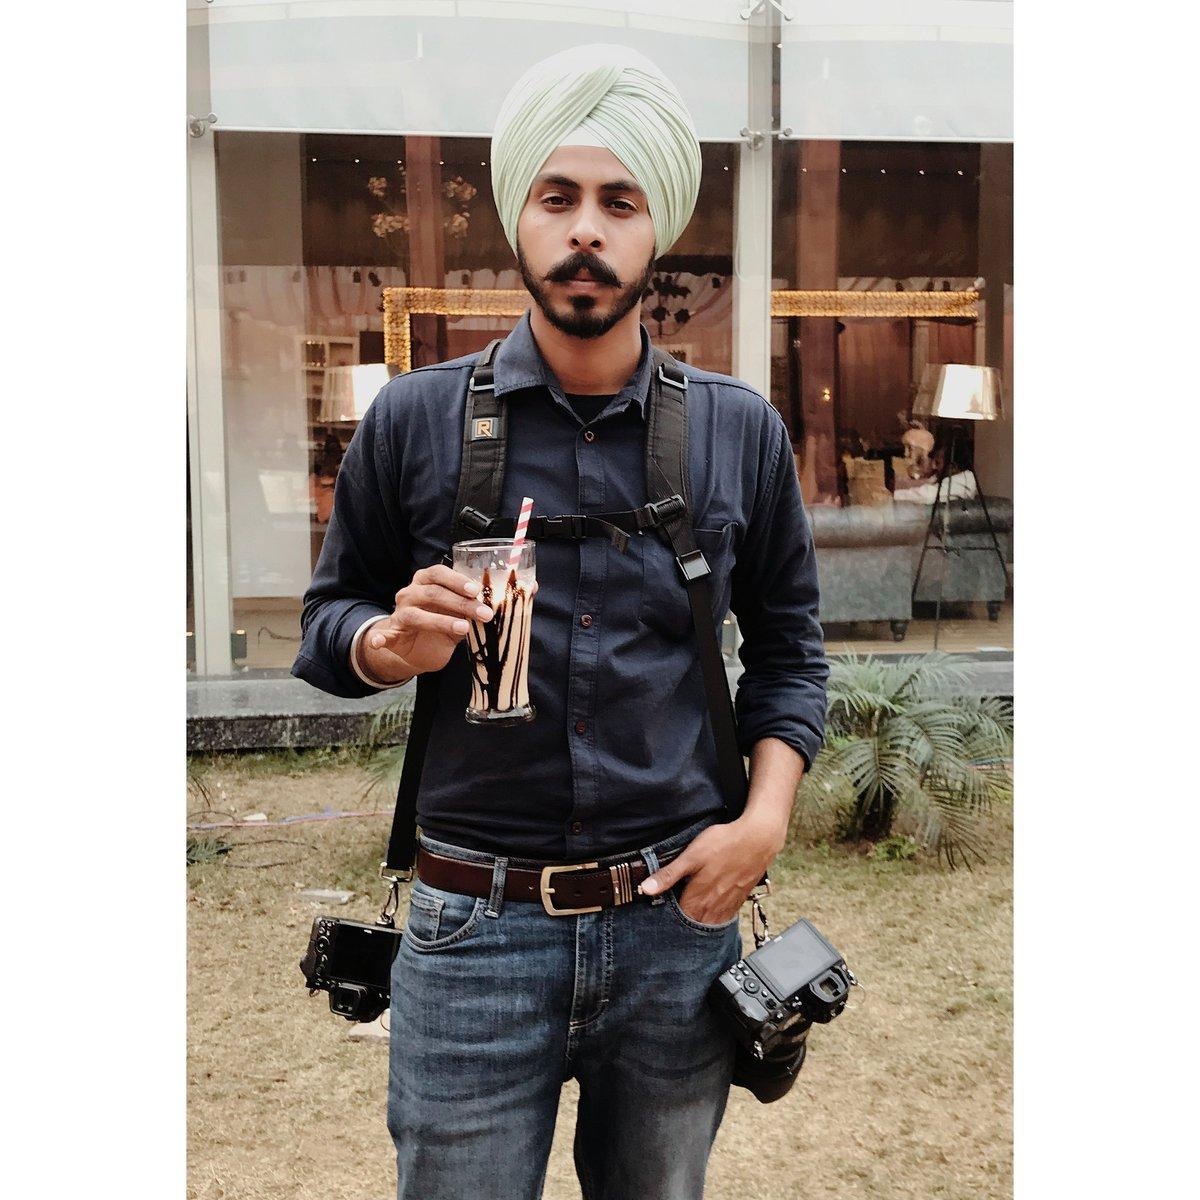 ♤ @lens_of_lightt #wedding #weddingday #weddingphotography #weddinginspiration #weddingplanner #photography #photographer #photoshoot #chandigarh #cavanalhillresort #lifestyle #passion #men #travel #traveller #vscocam #vsco #google #instagram #lens_of_light